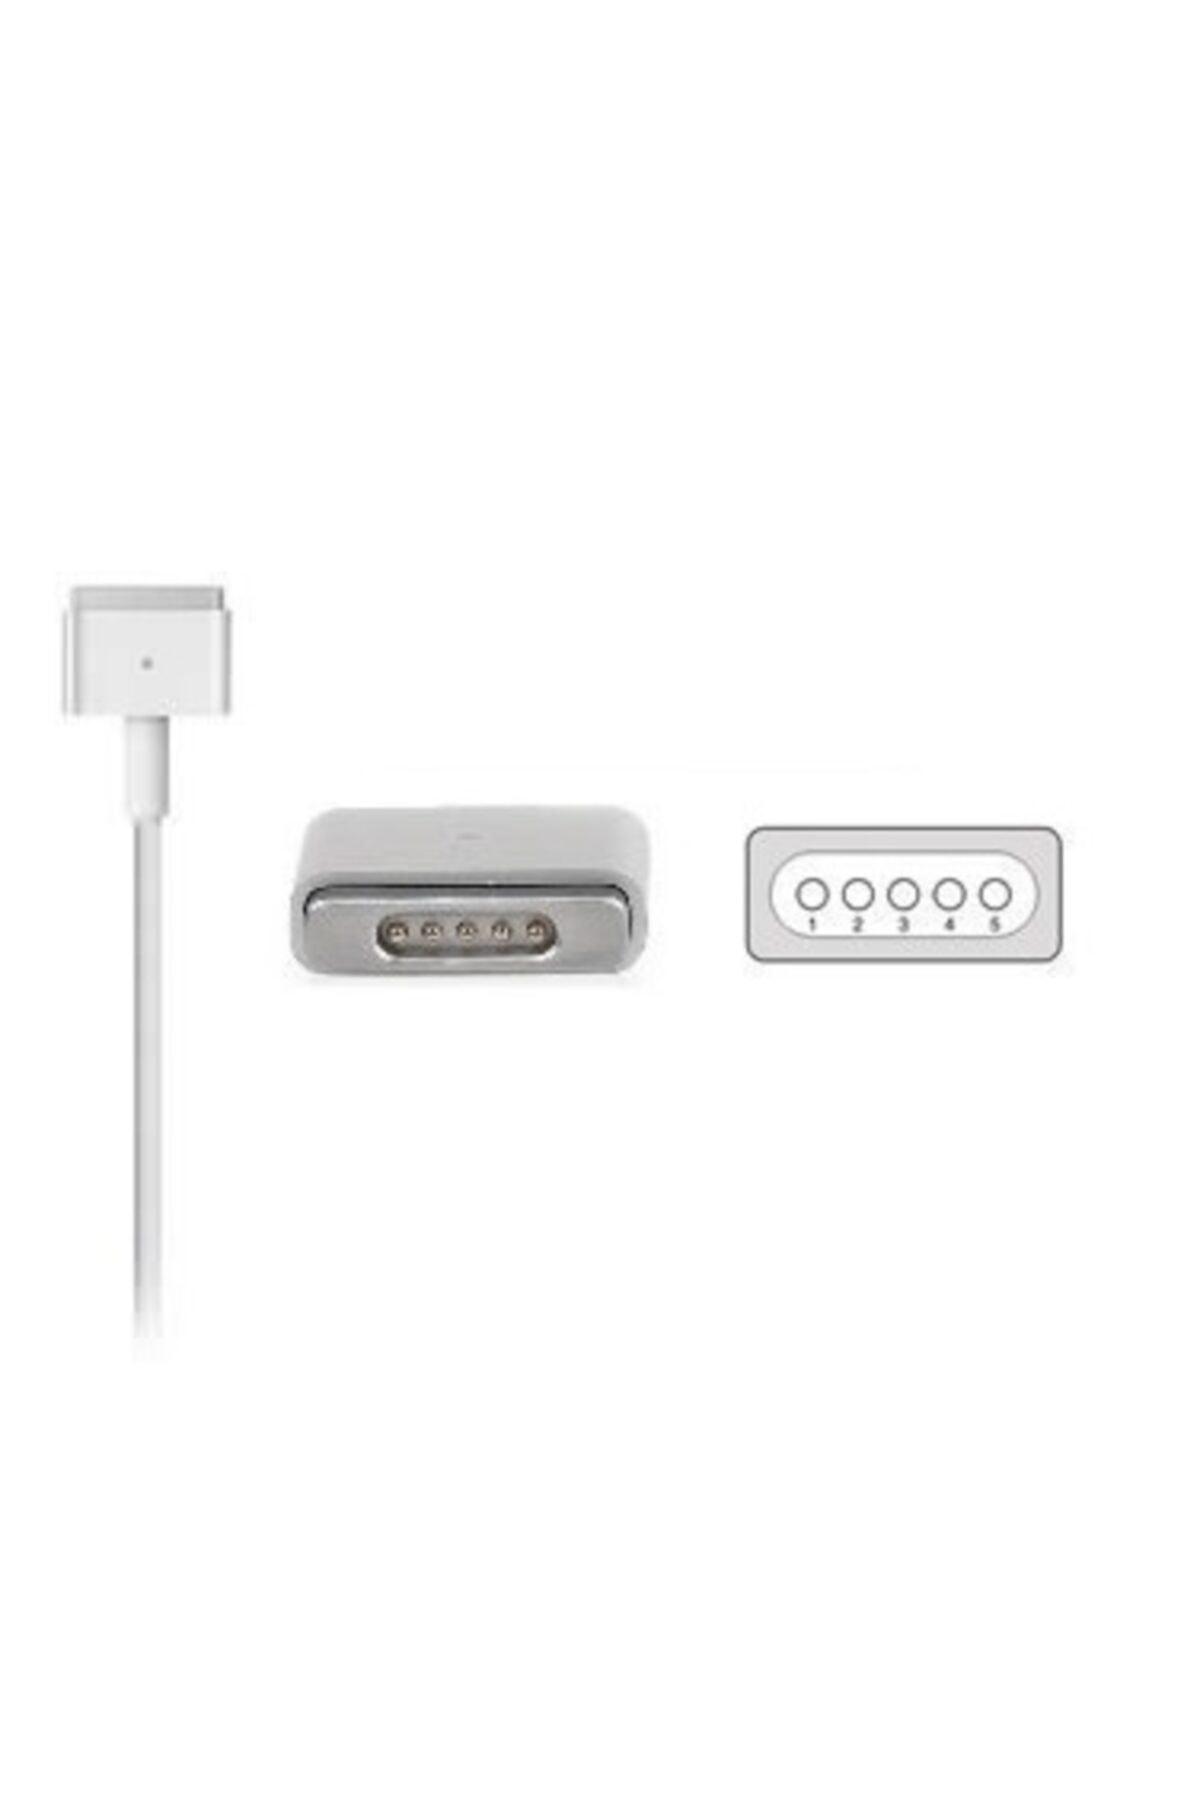 ATAELEKTRONİK Kaliteli Muadil Macbook Air (11-inch, Önce 2015) 14.85v 3.05a 45w Magsafe 2 Güç Adaptörü Şarj Cihazı 1